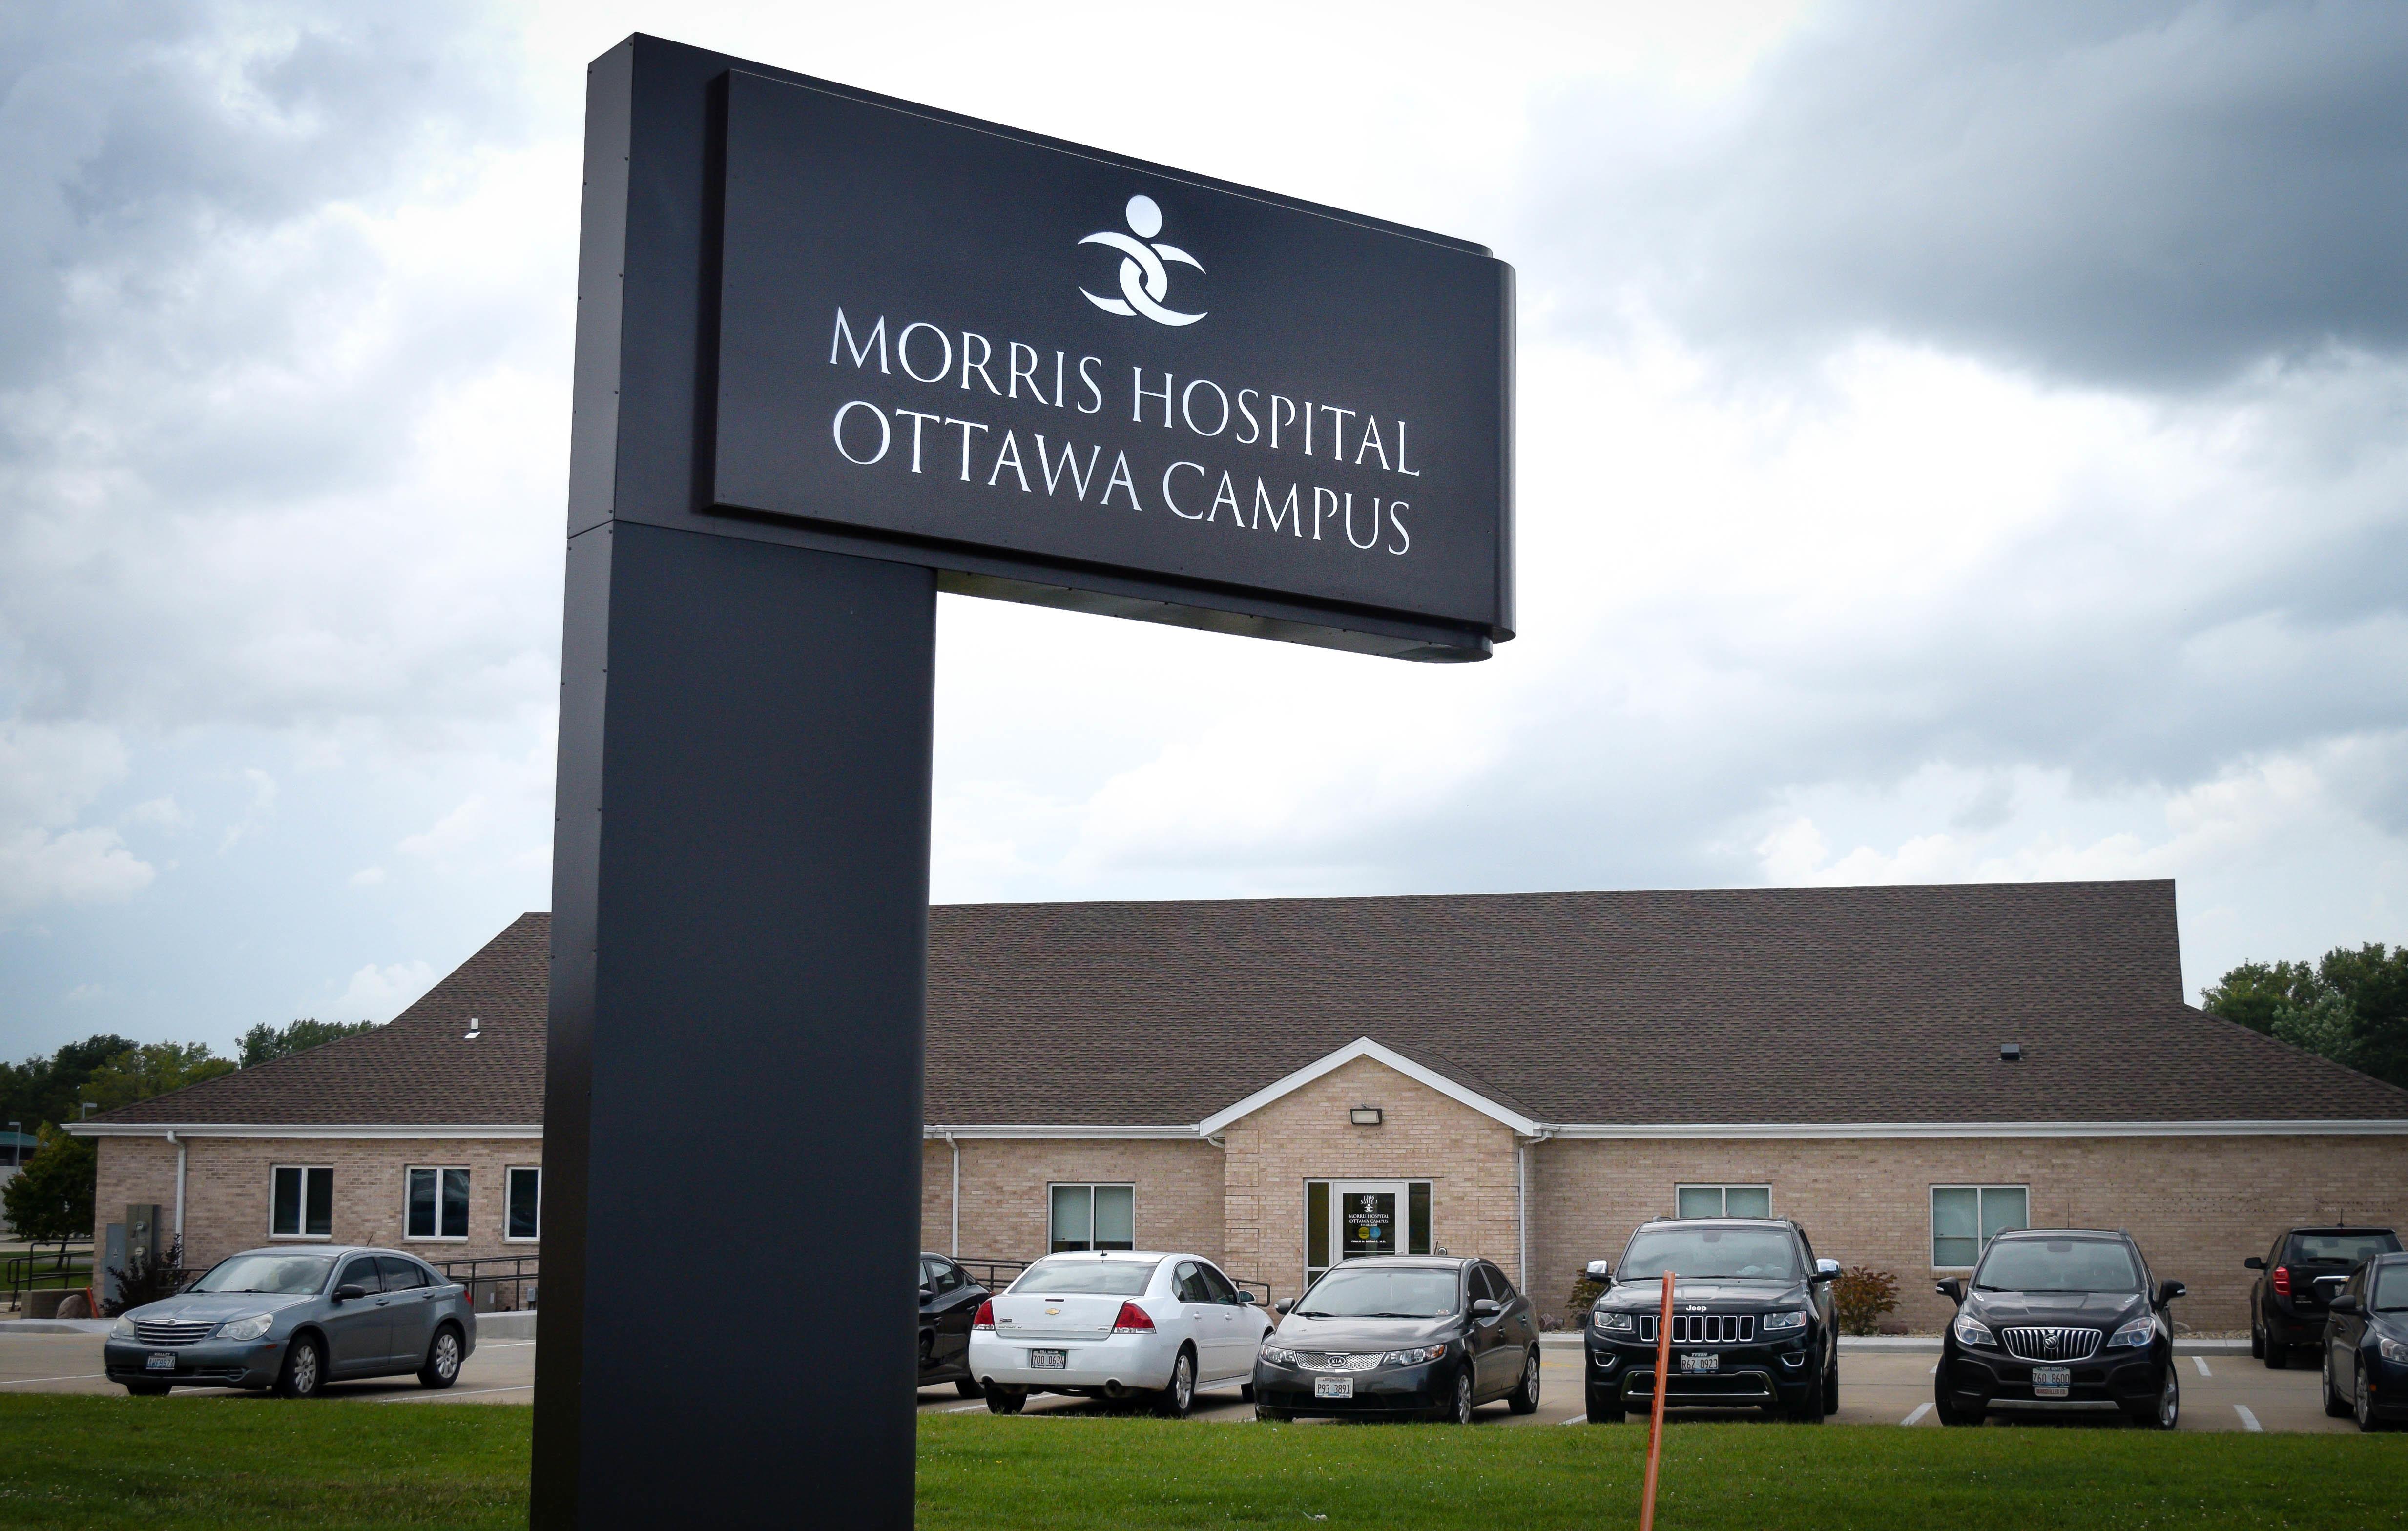 Morris Hospital Ottawa Campus image 1